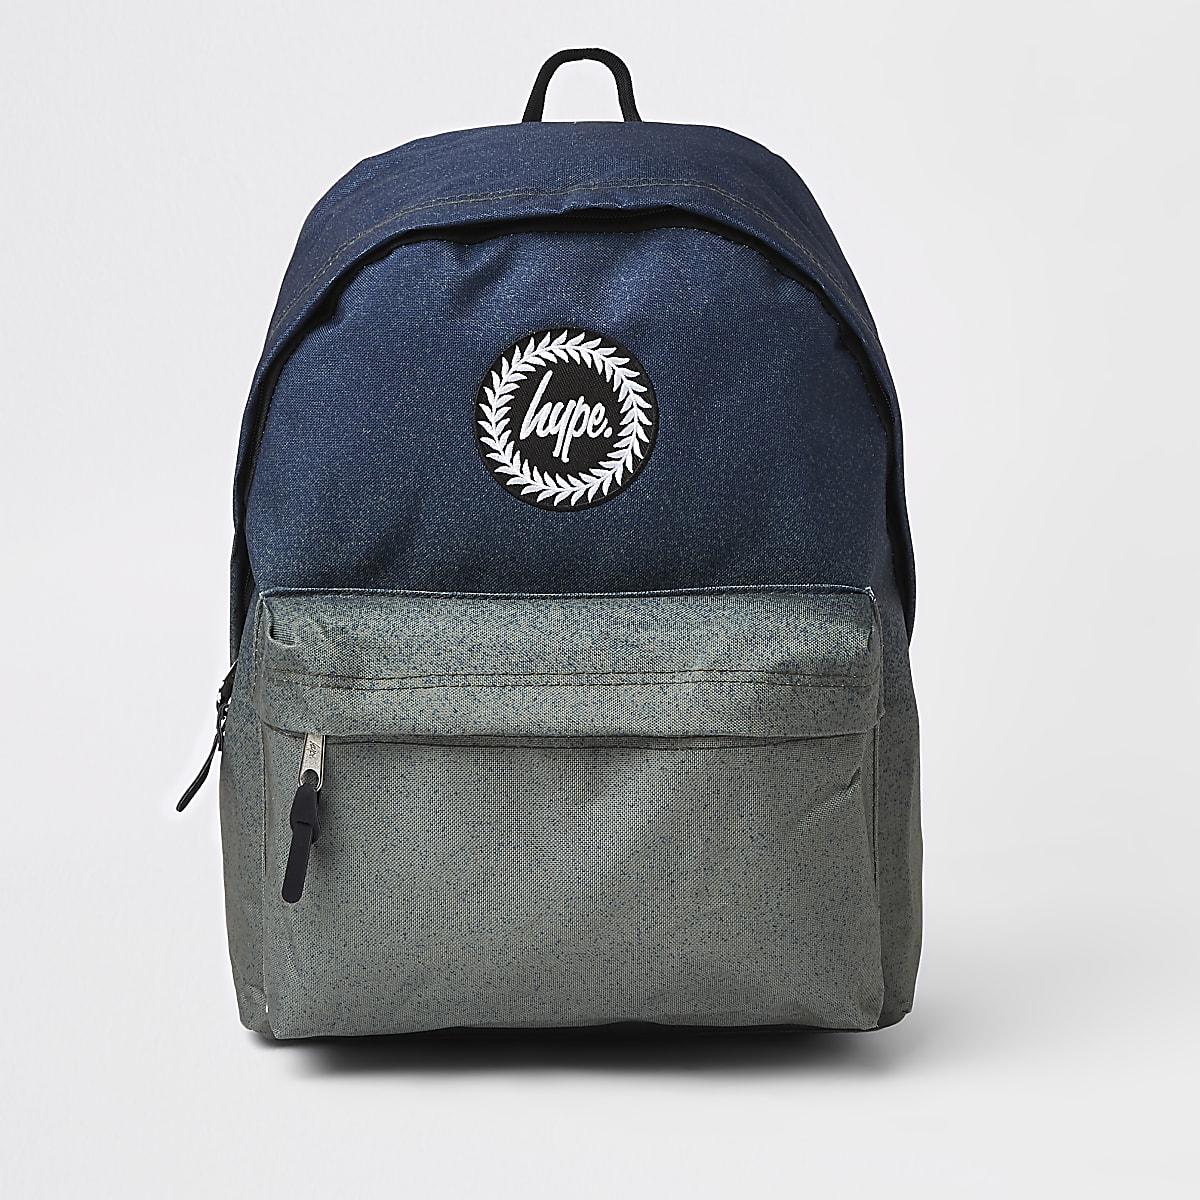 Hype khaki ombre backpack